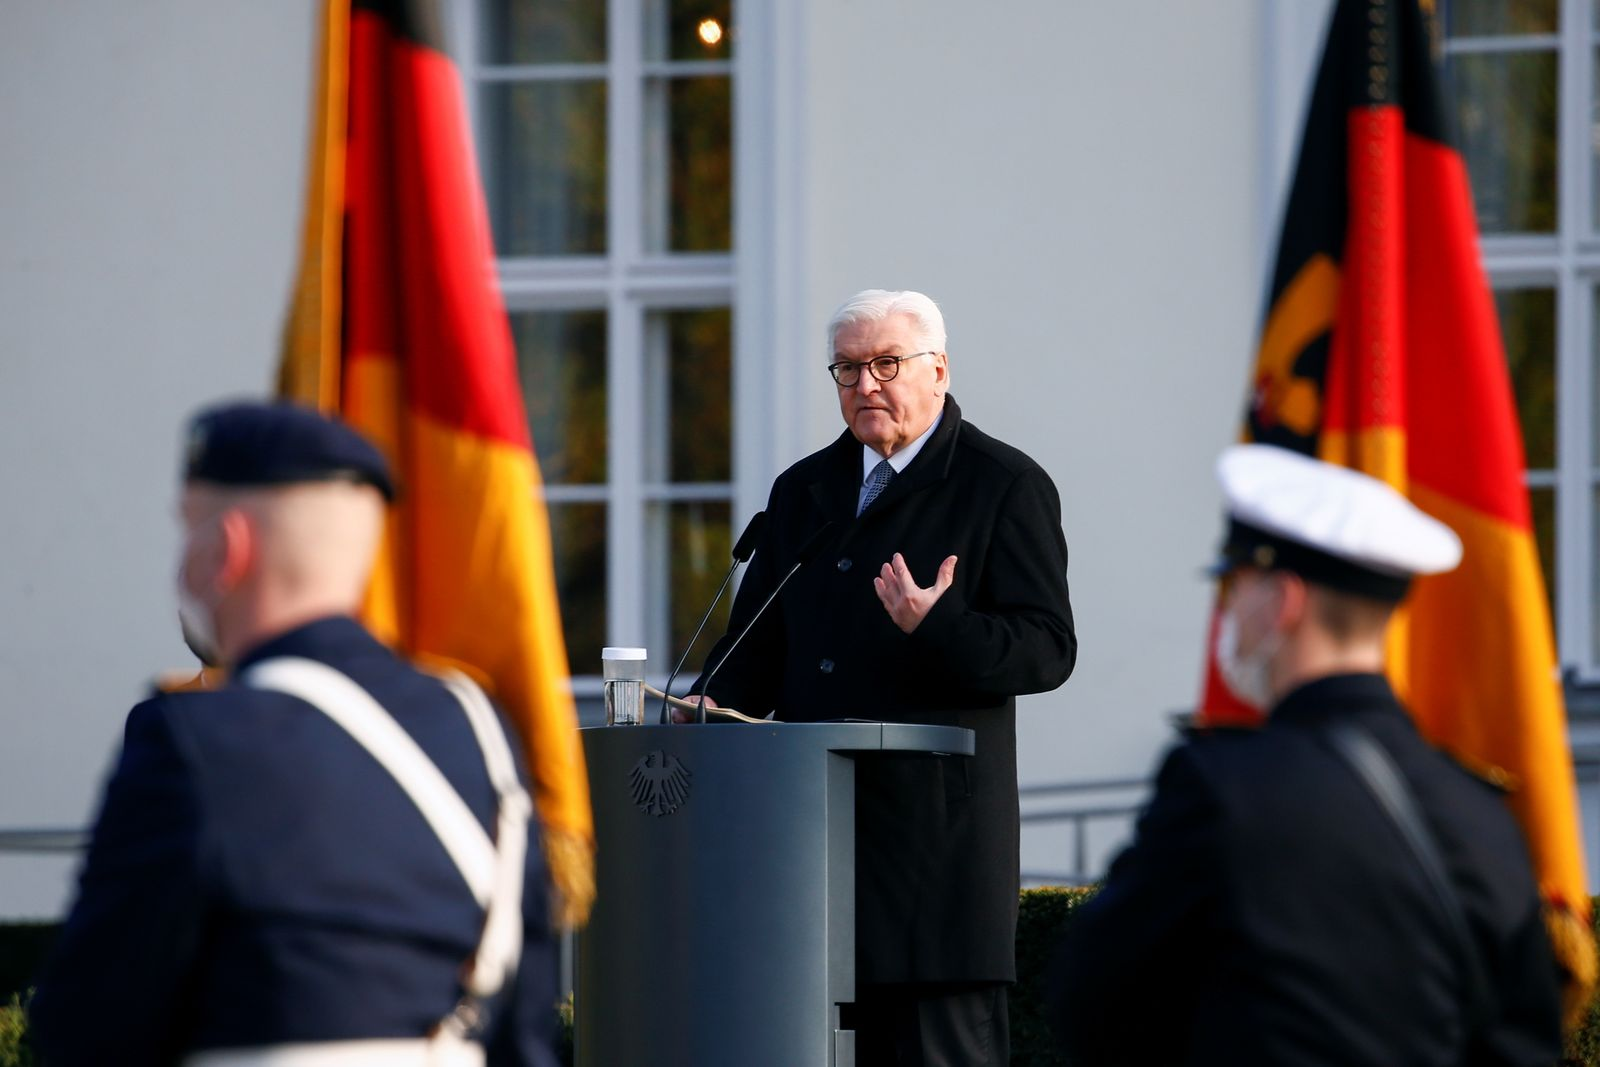 Swearing-in ceremony of German armed forces Bundeswehr soldiers in Berlin